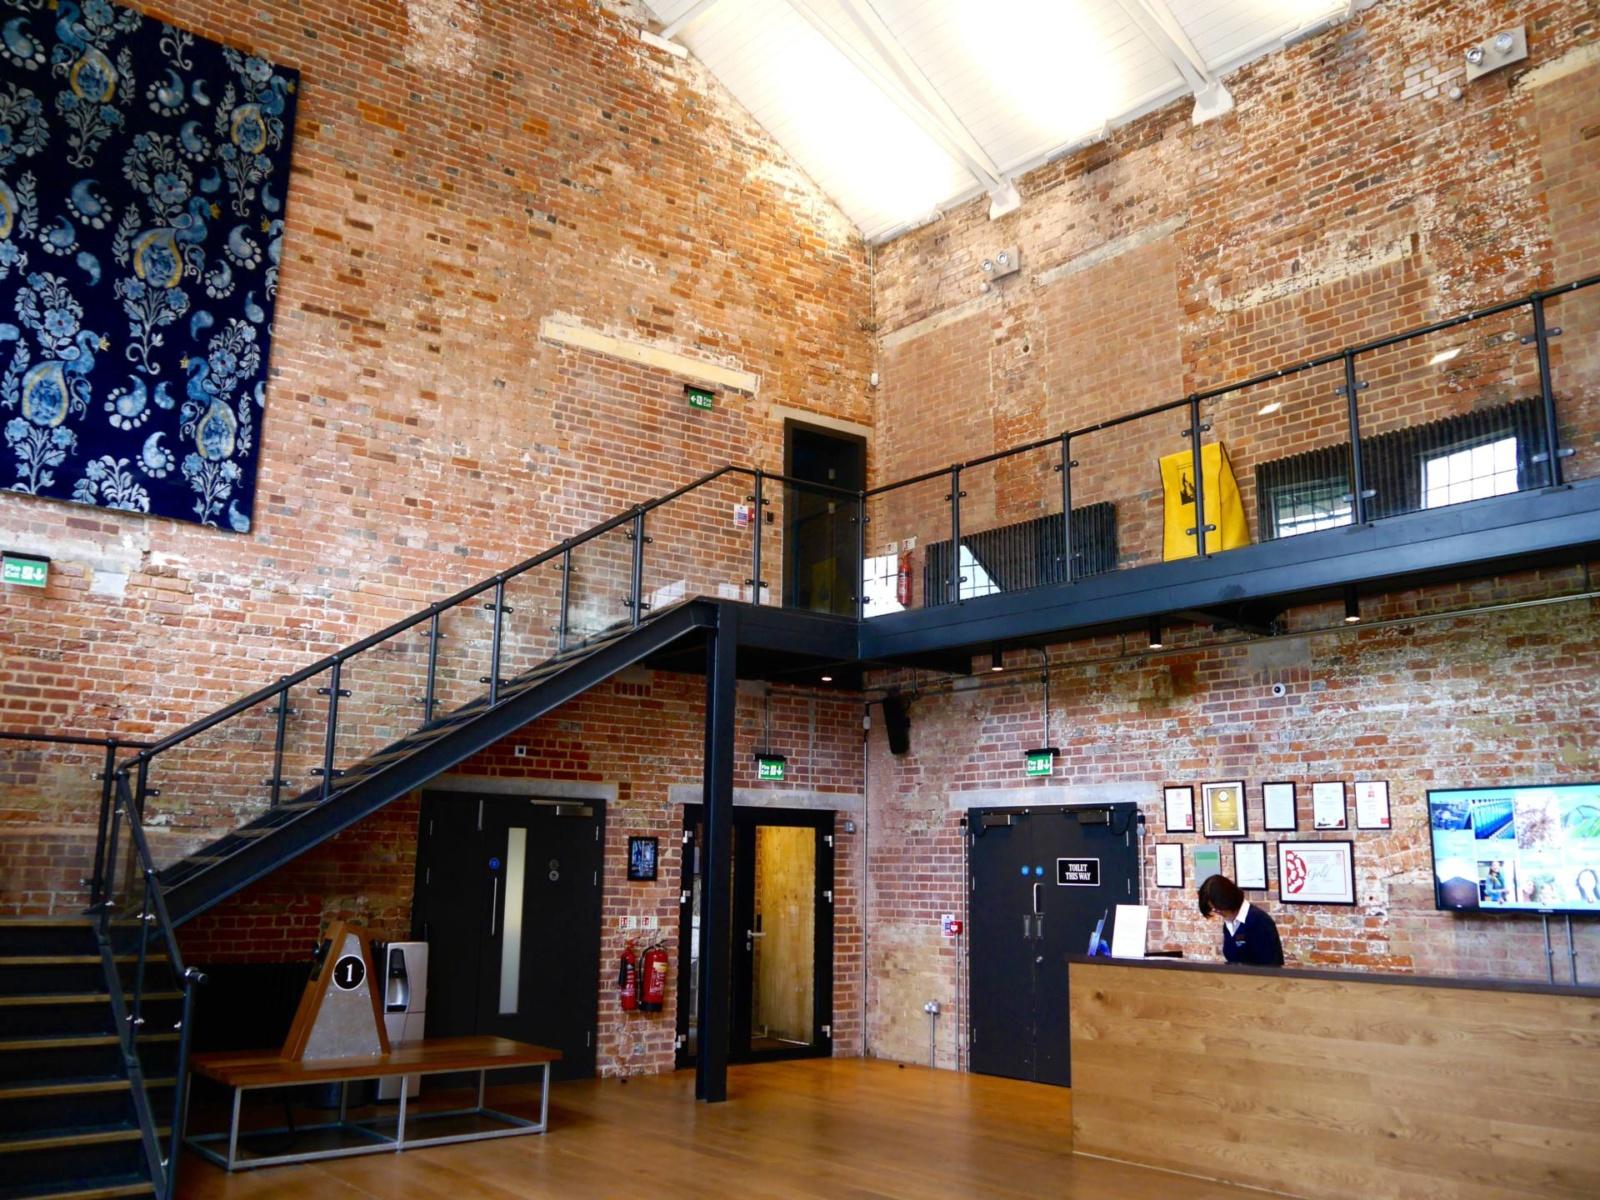 bombay-sapphire-distillery-laverstoke-mill-reception